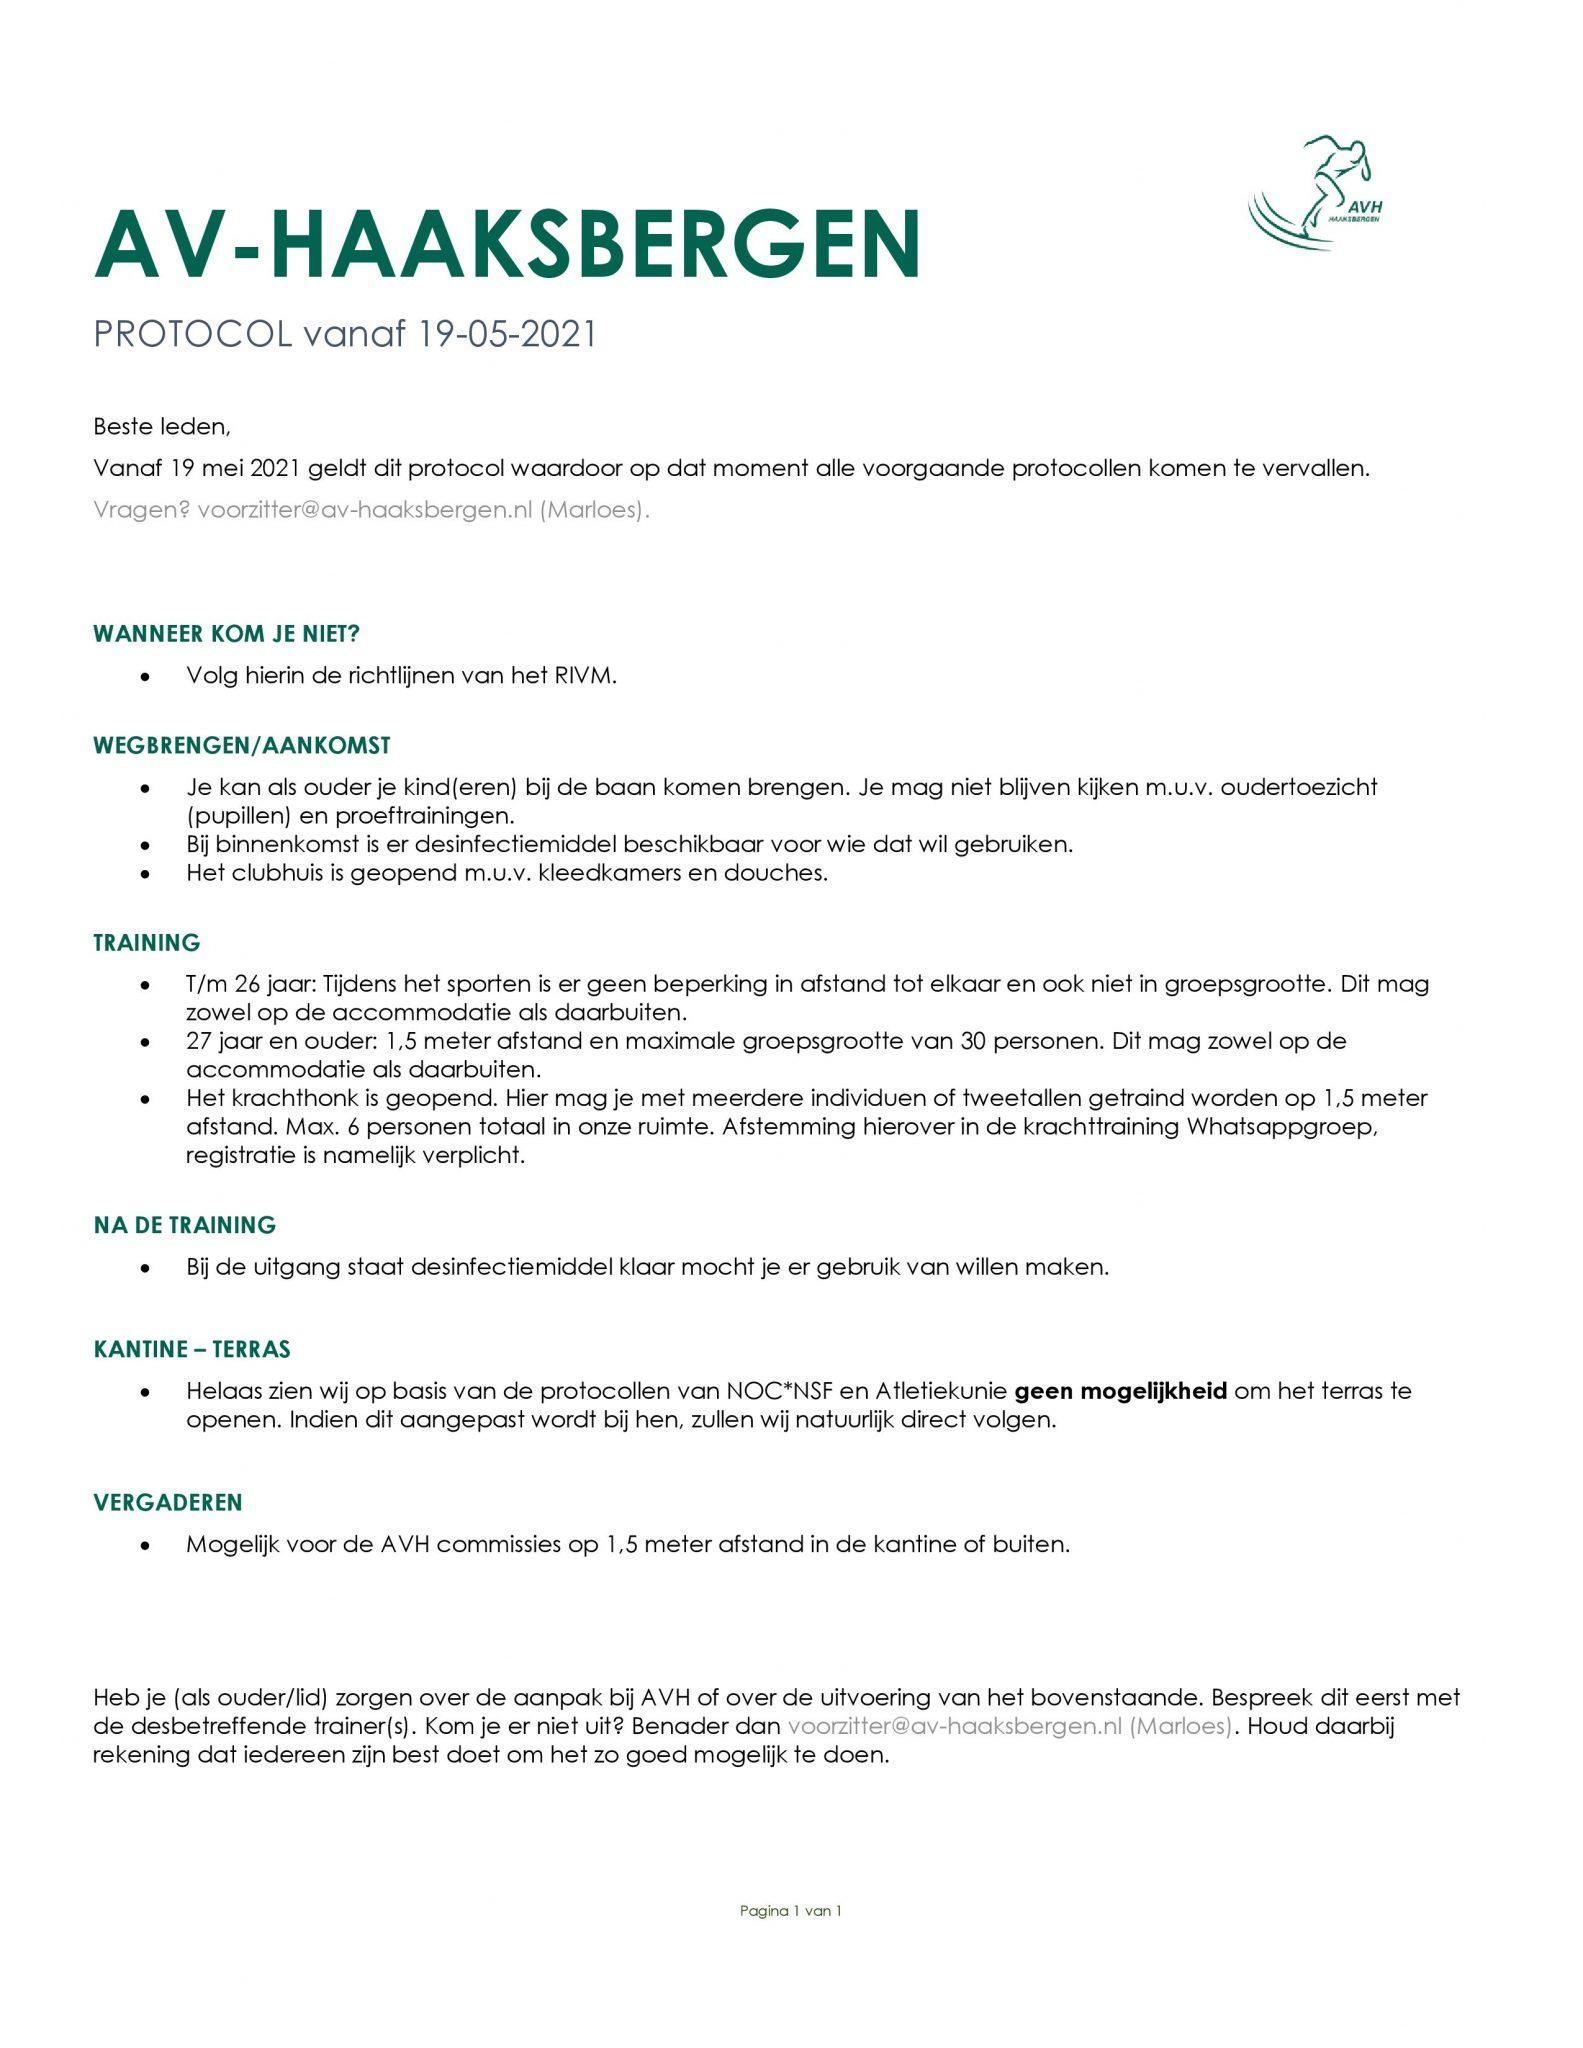 AVH Corona protocol per 19 mei 2021.